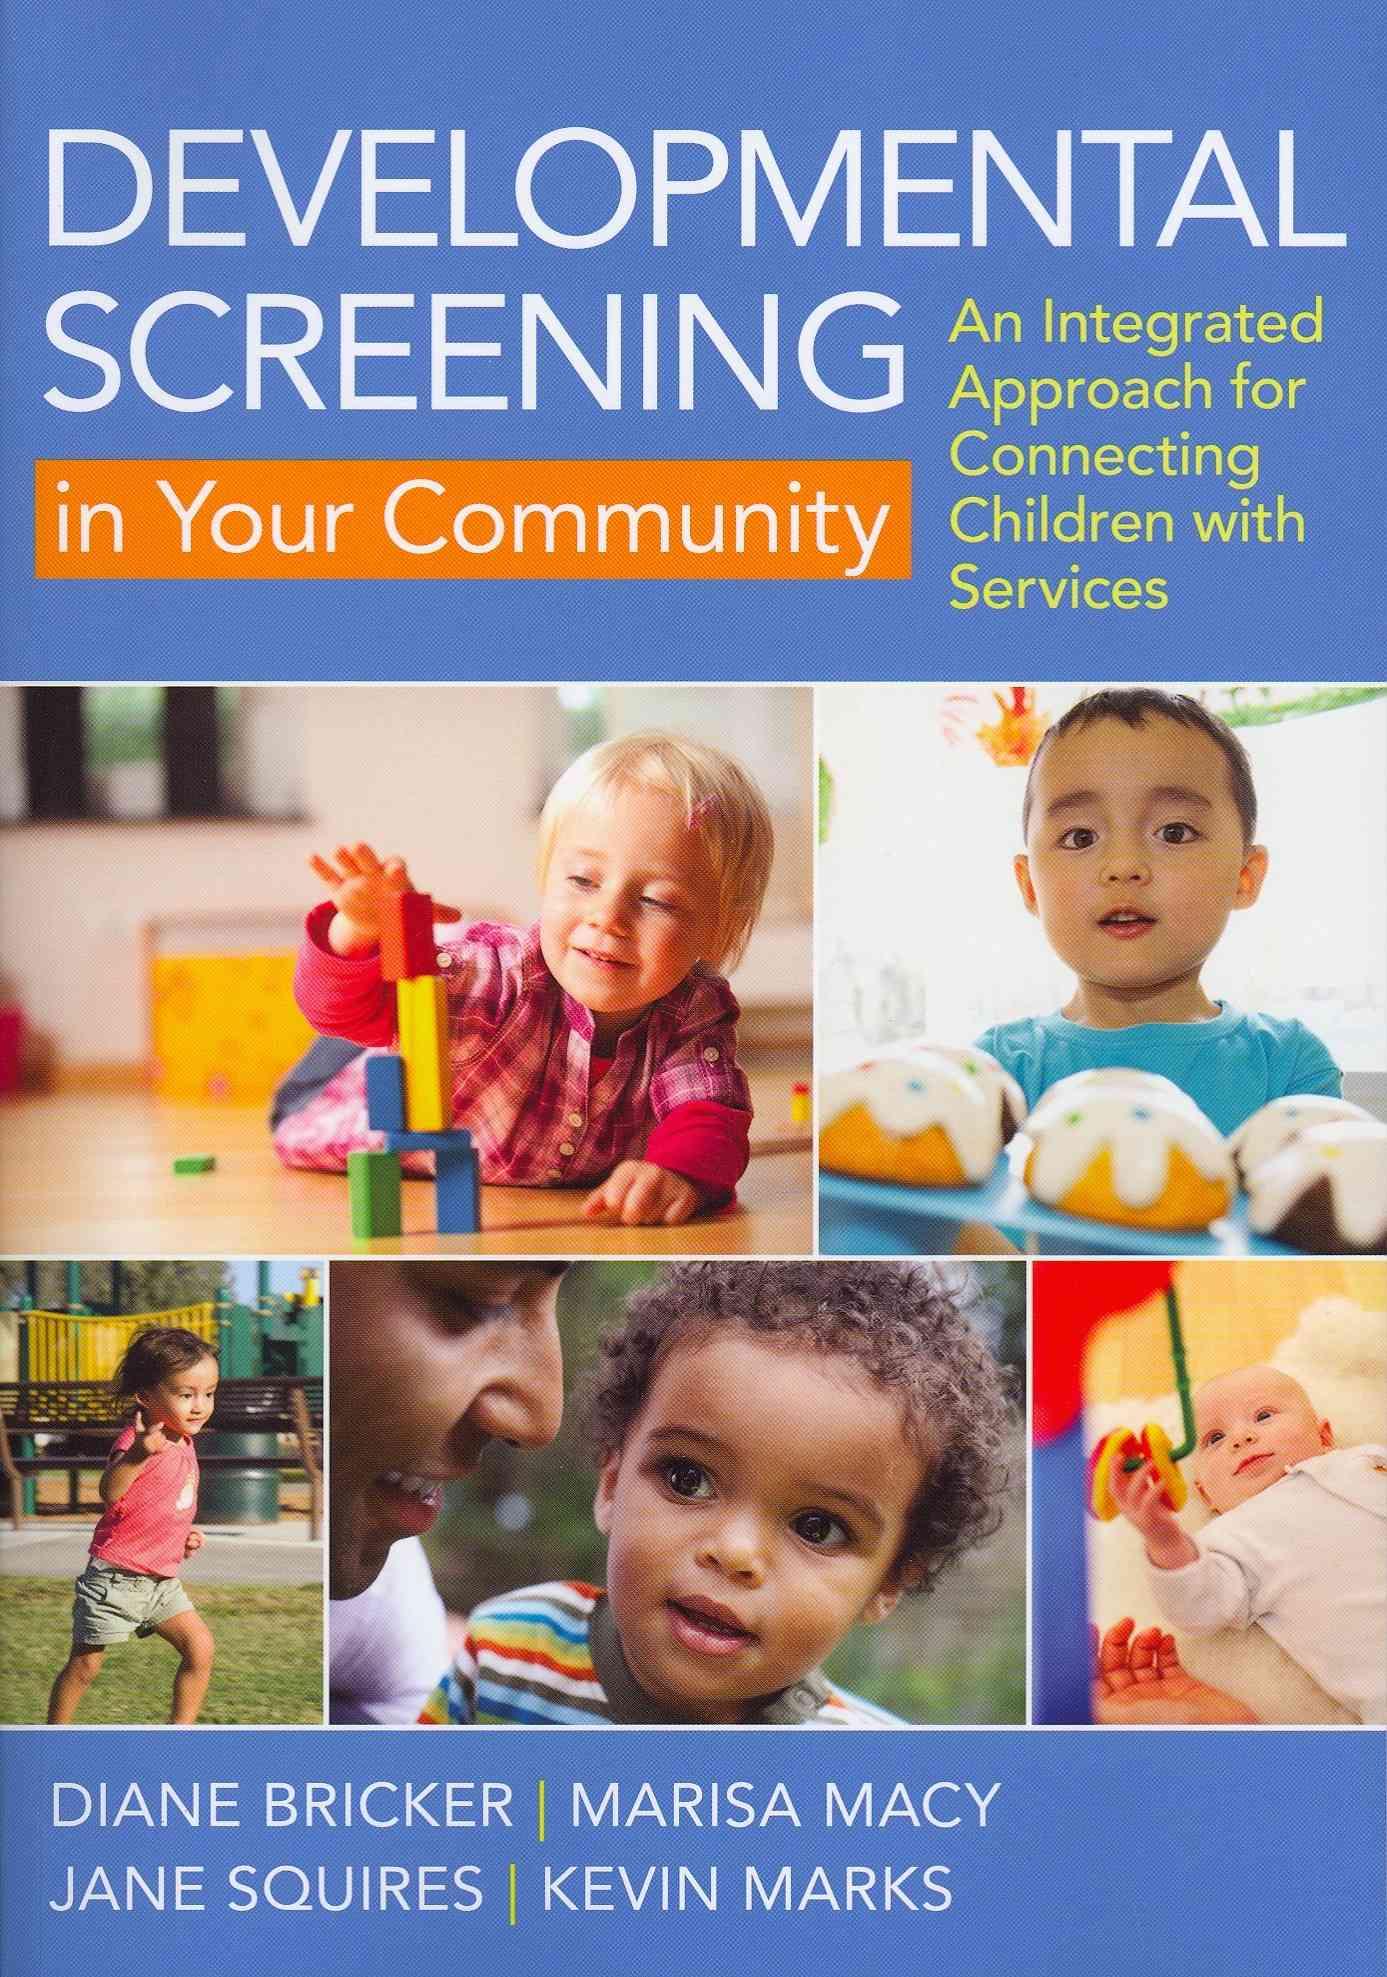 Developmental Screening in Your Community By Bricker, Diane/ Macy, Marisa/ Squires, Jane/ Marks, Kevin